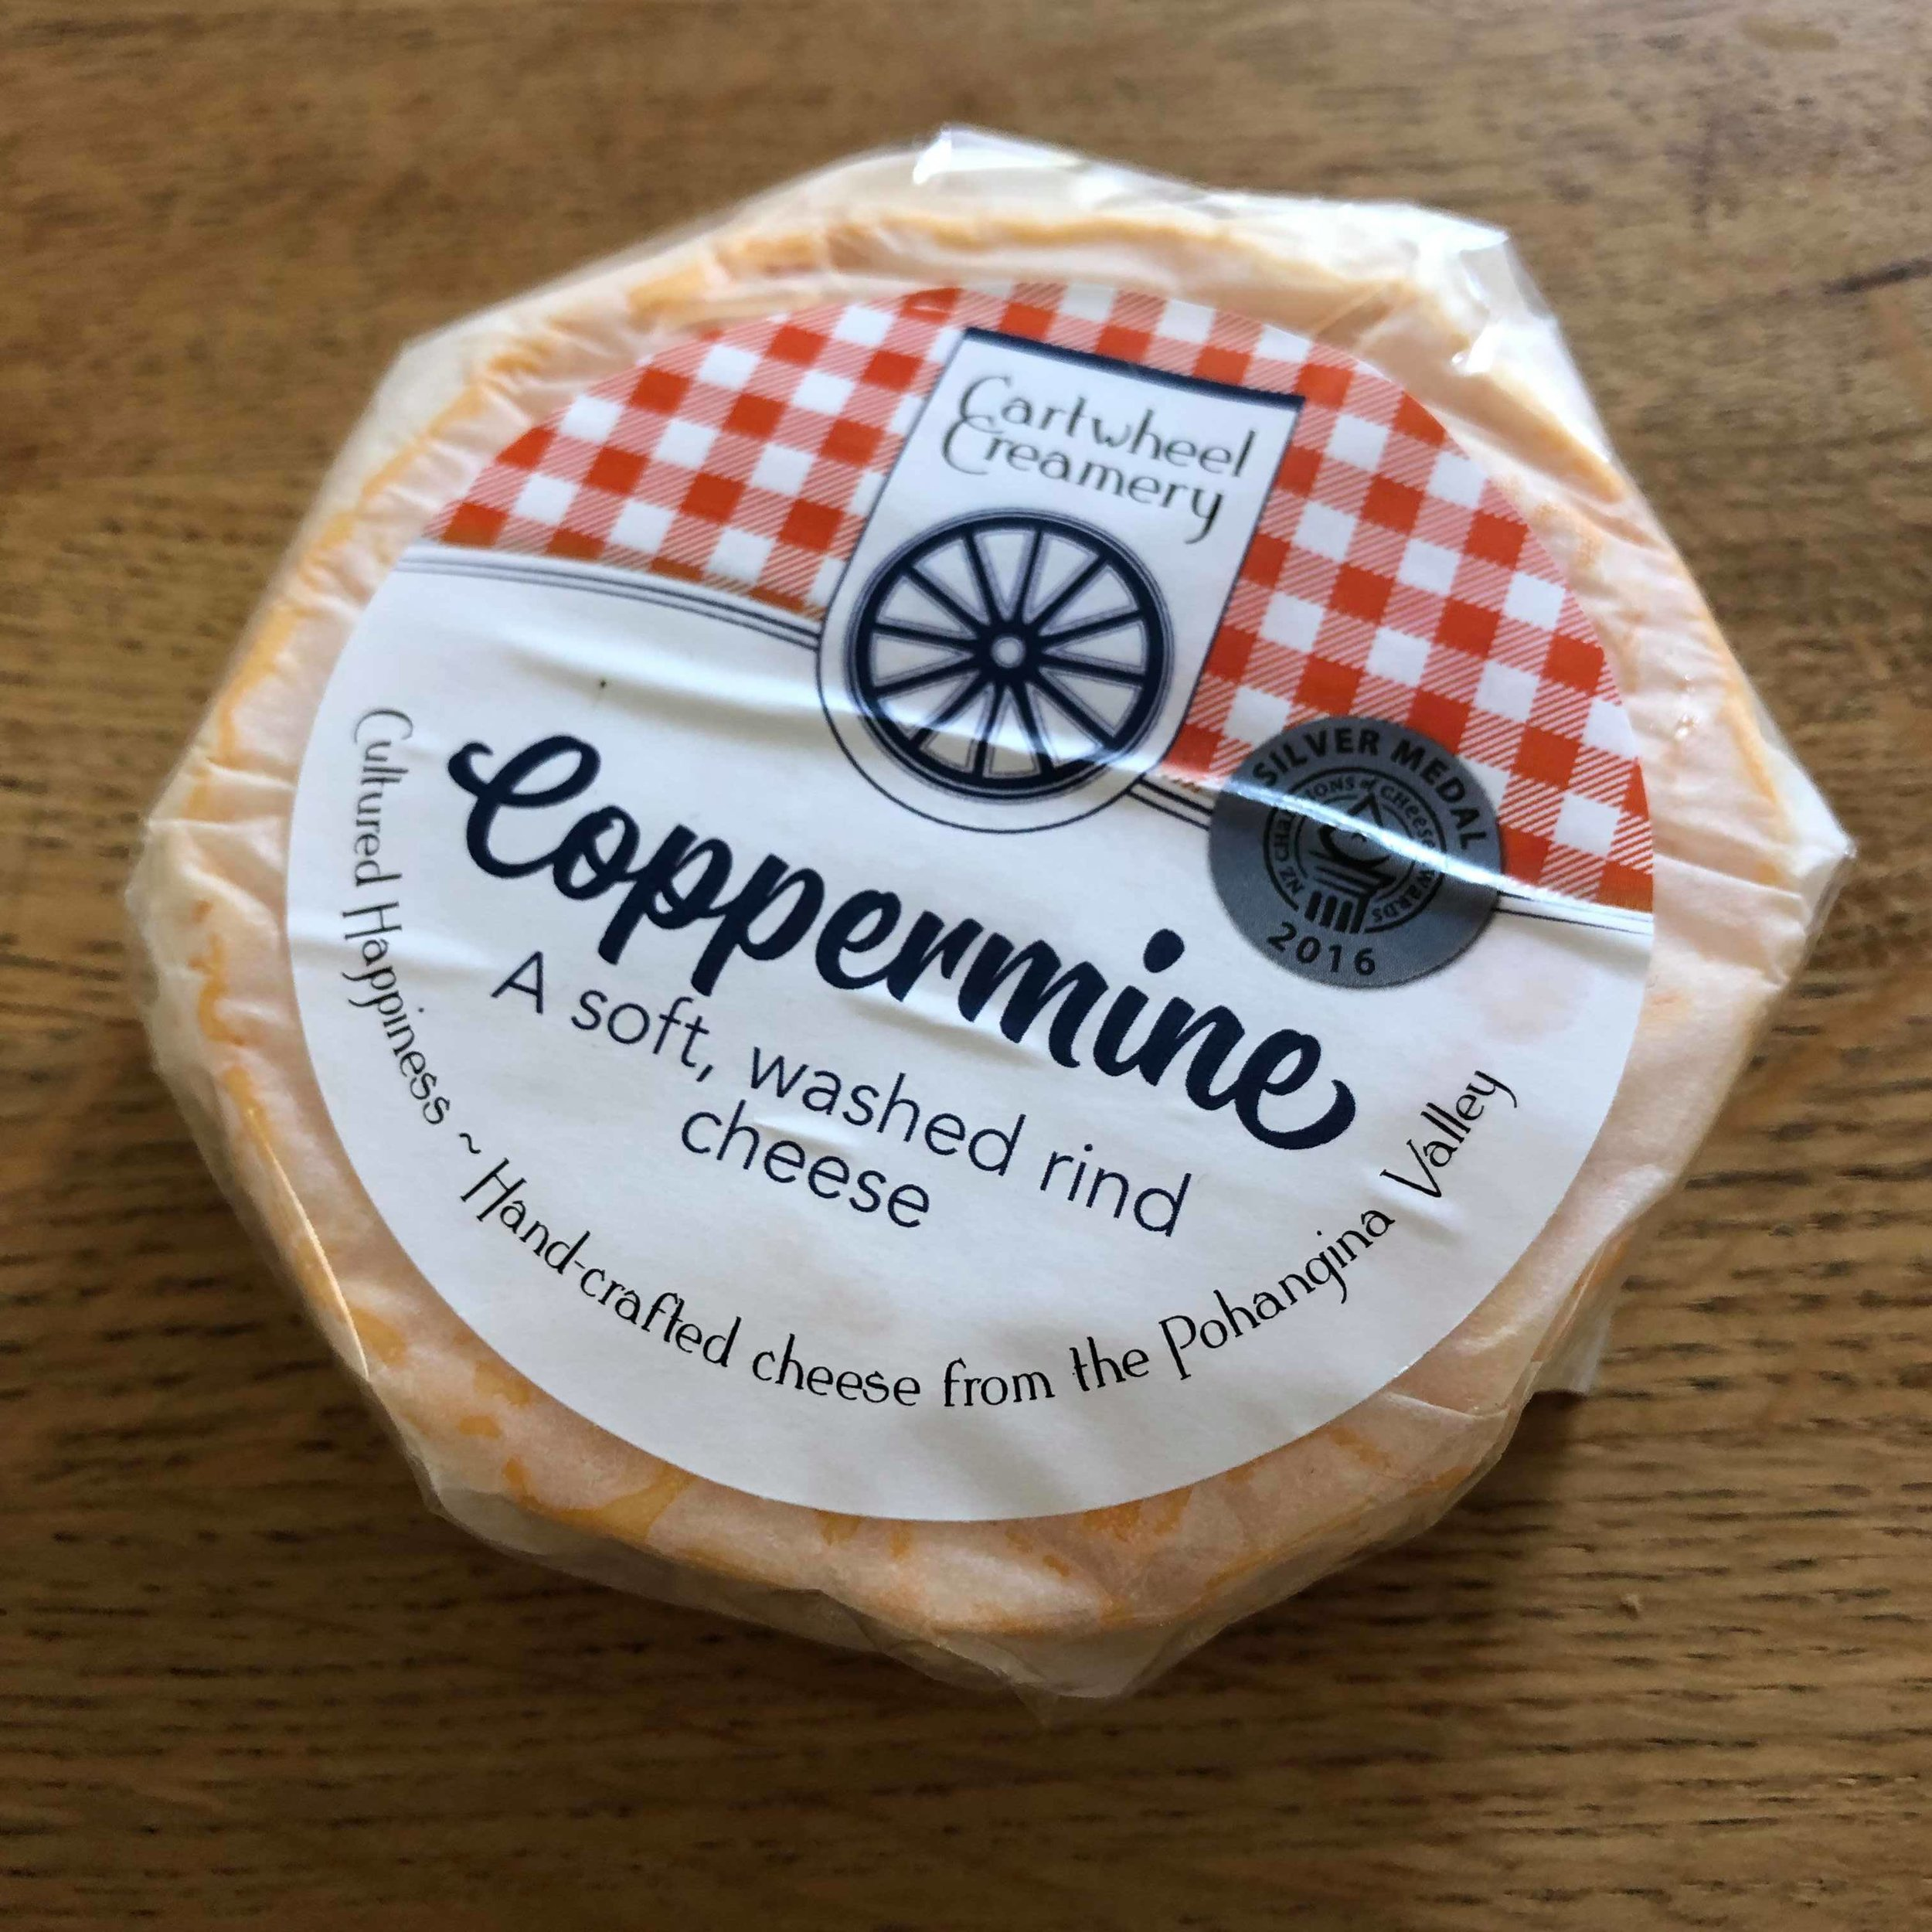 Coppermine Cartwheel Creamery - Packaging